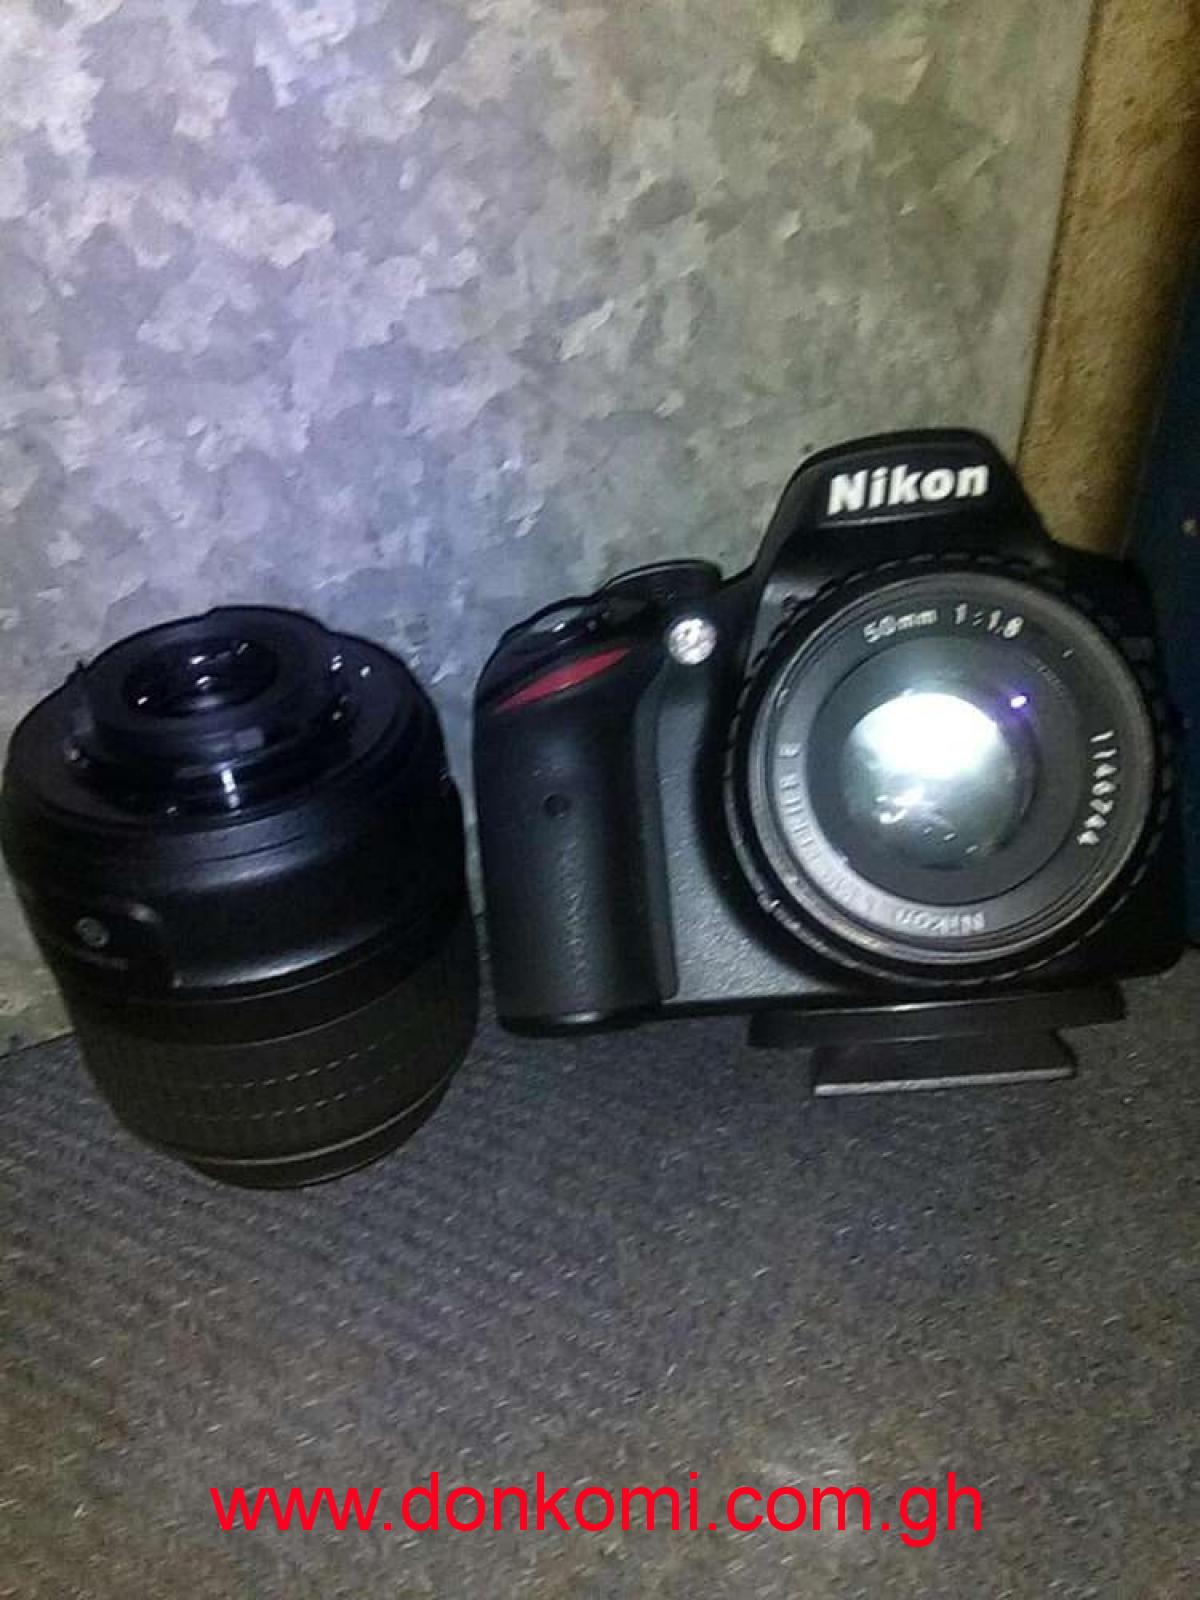 Nikon DX 3200